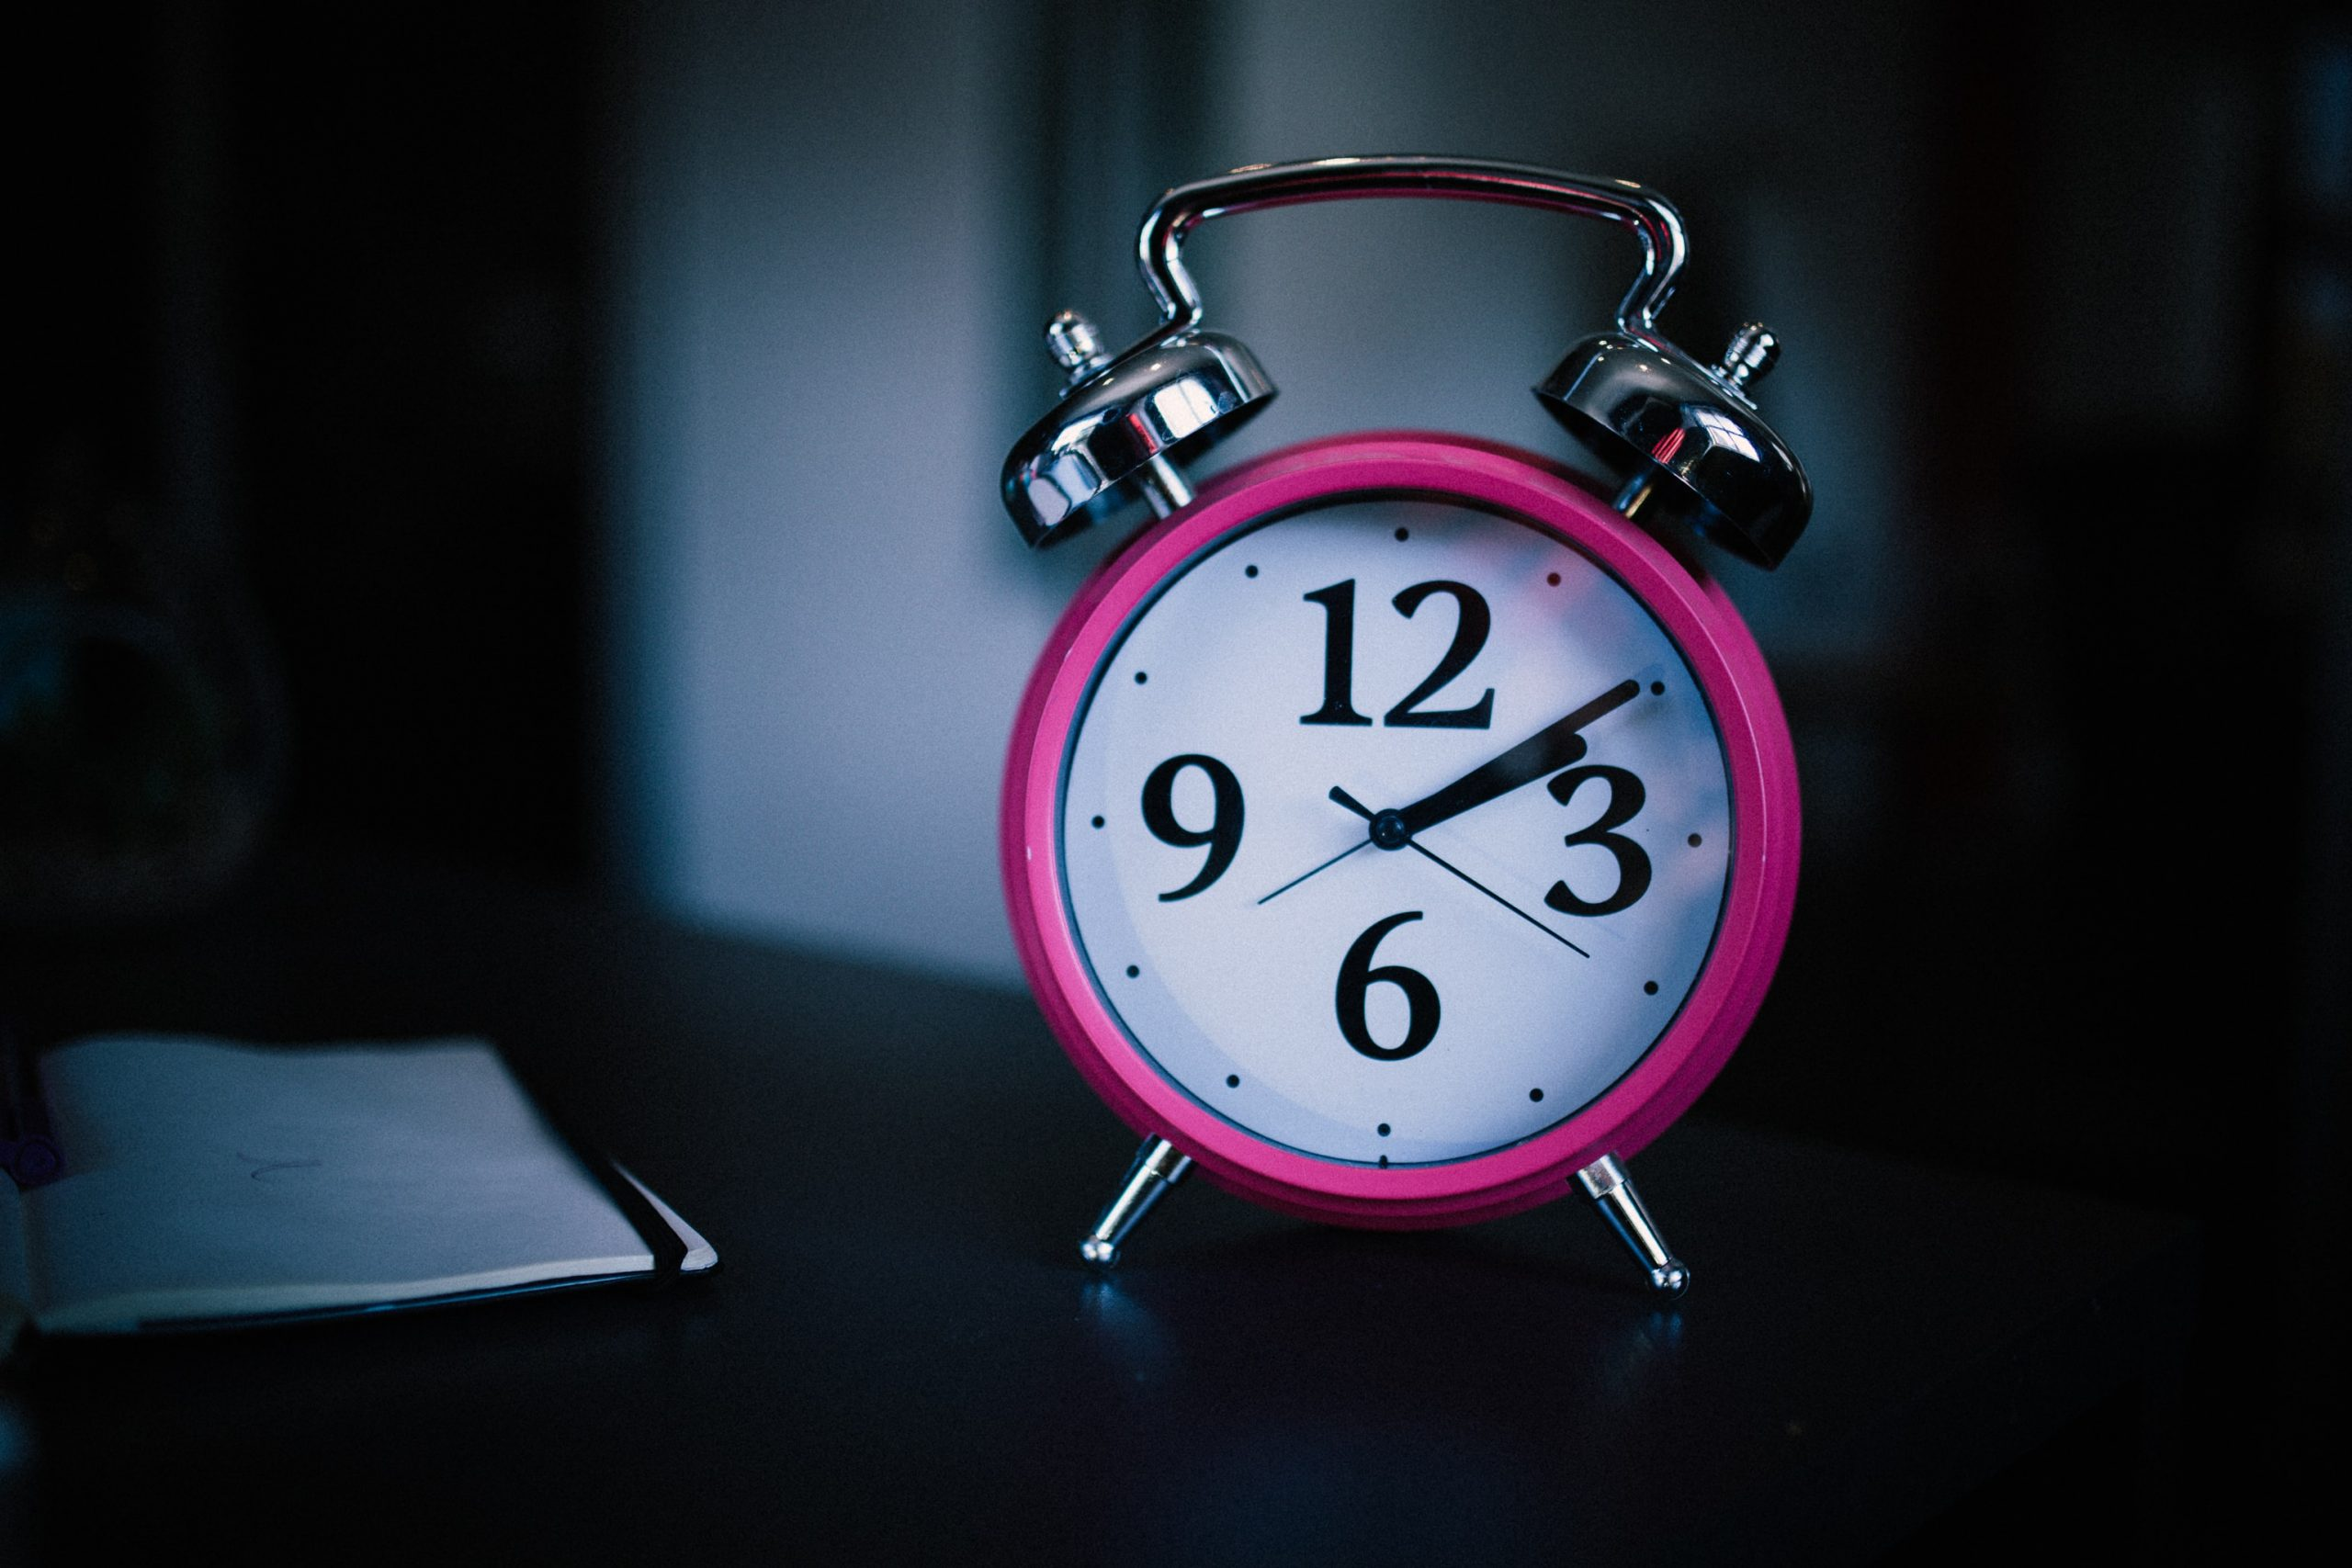 Sleep: A Step Towards Battling Mental Illness